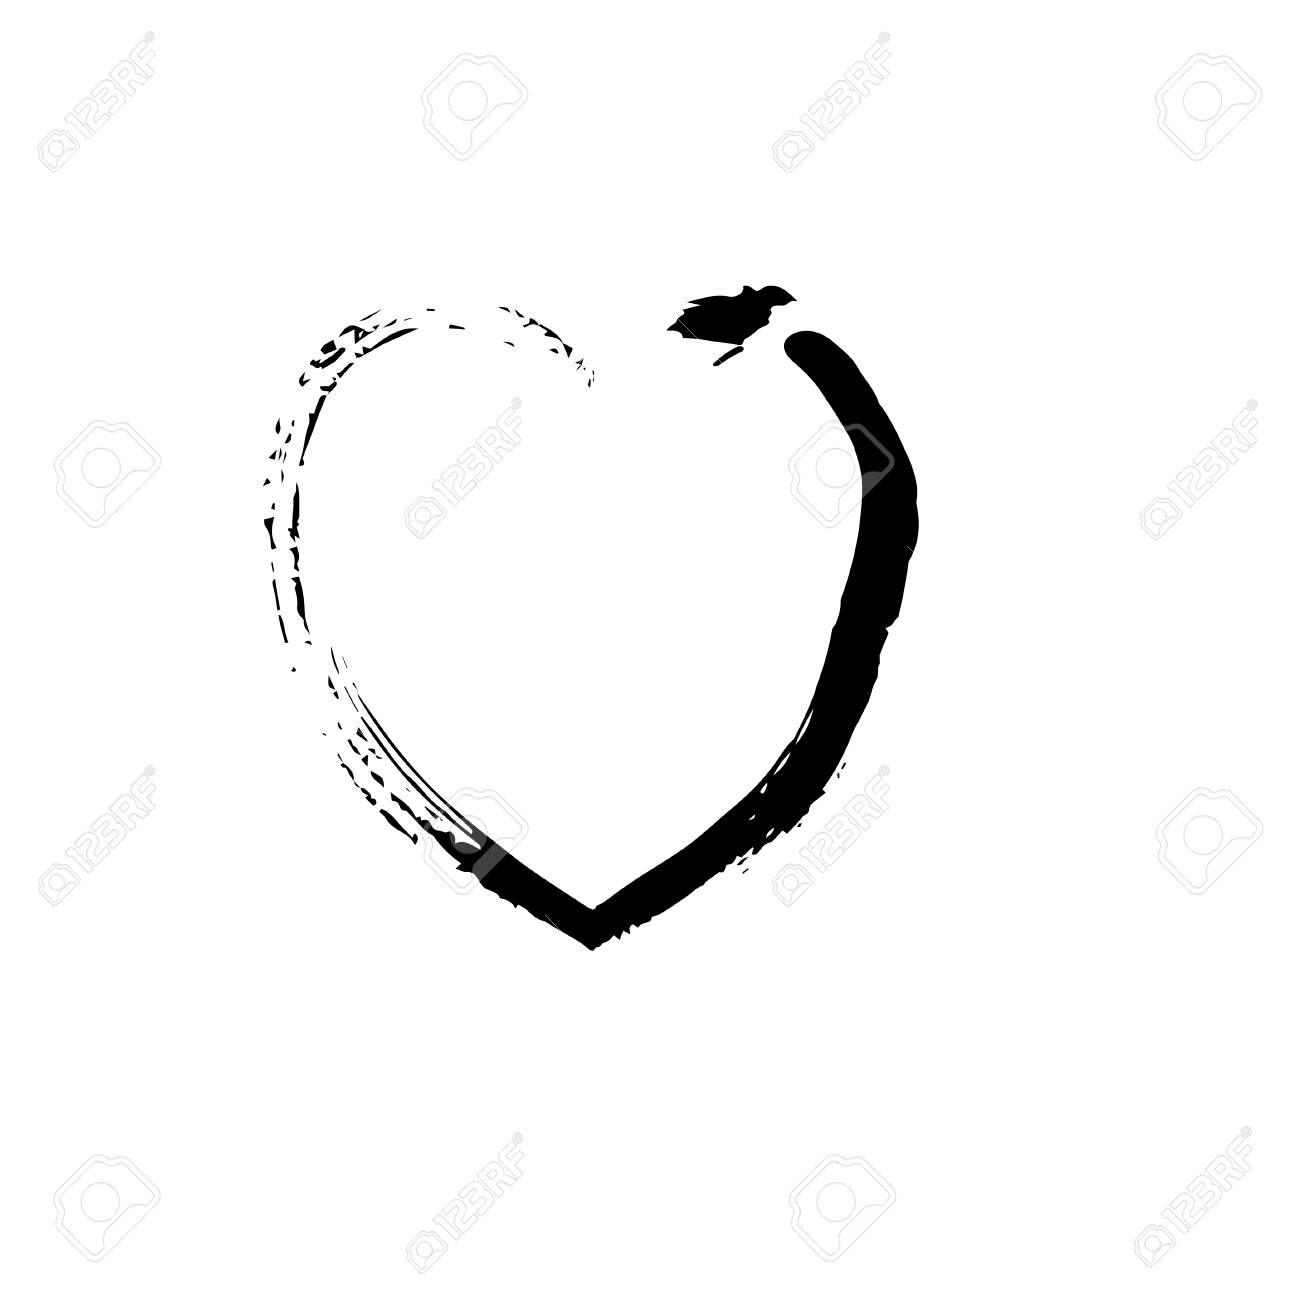 Heart shape symbol choice image symbol and sign ideas heart shape symbol love vector black heart symbol wedding and heart shape symbol love vector black buycottarizona Image collections